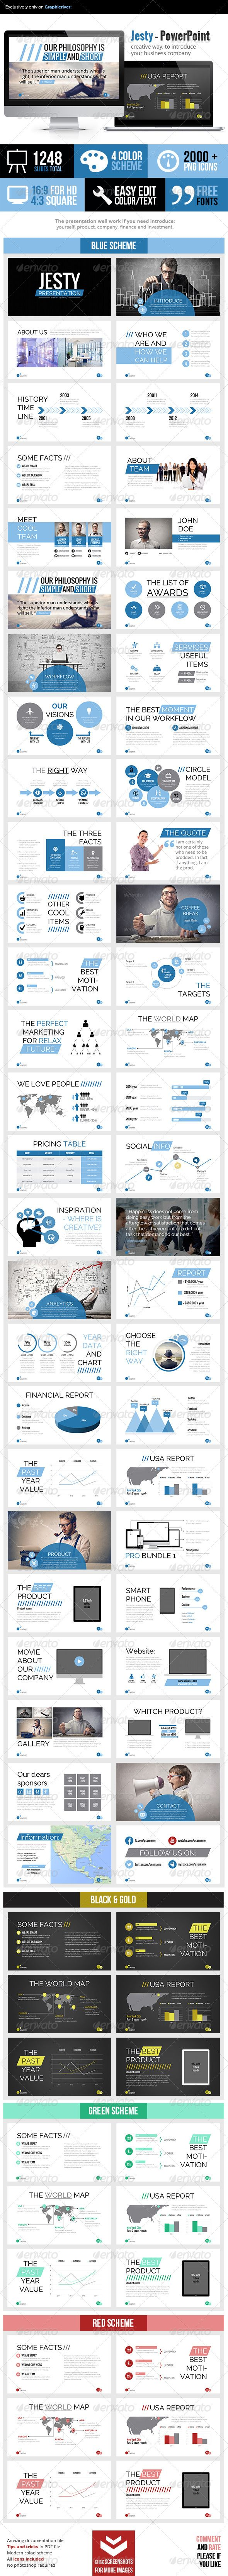 Jesty powerpoint presentation template update v10 business jesty powerpoint presentation template update v10 toneelgroepblik Image collections